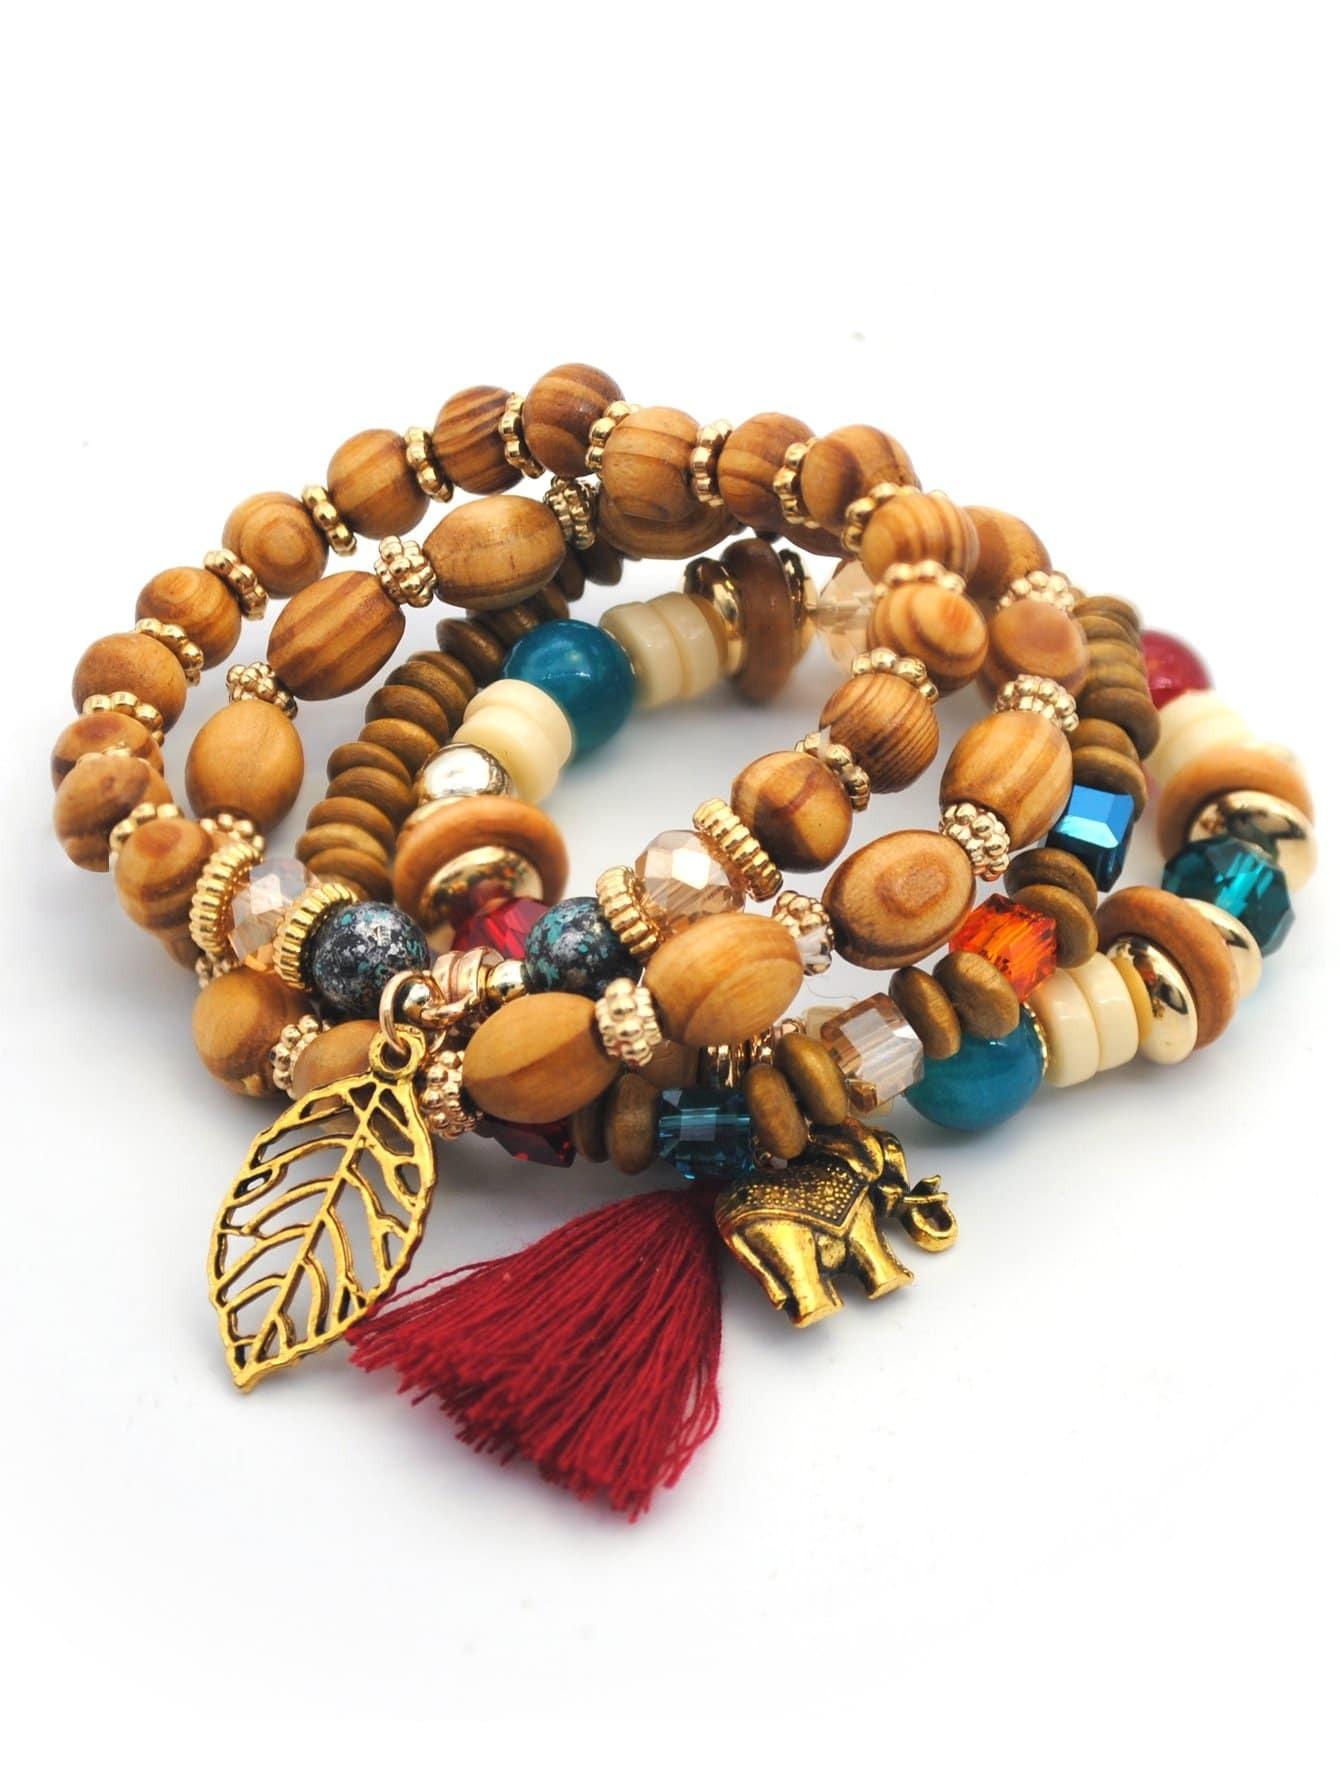 Beads Armband Set mit ausgehöhltem Blatt 4pcs